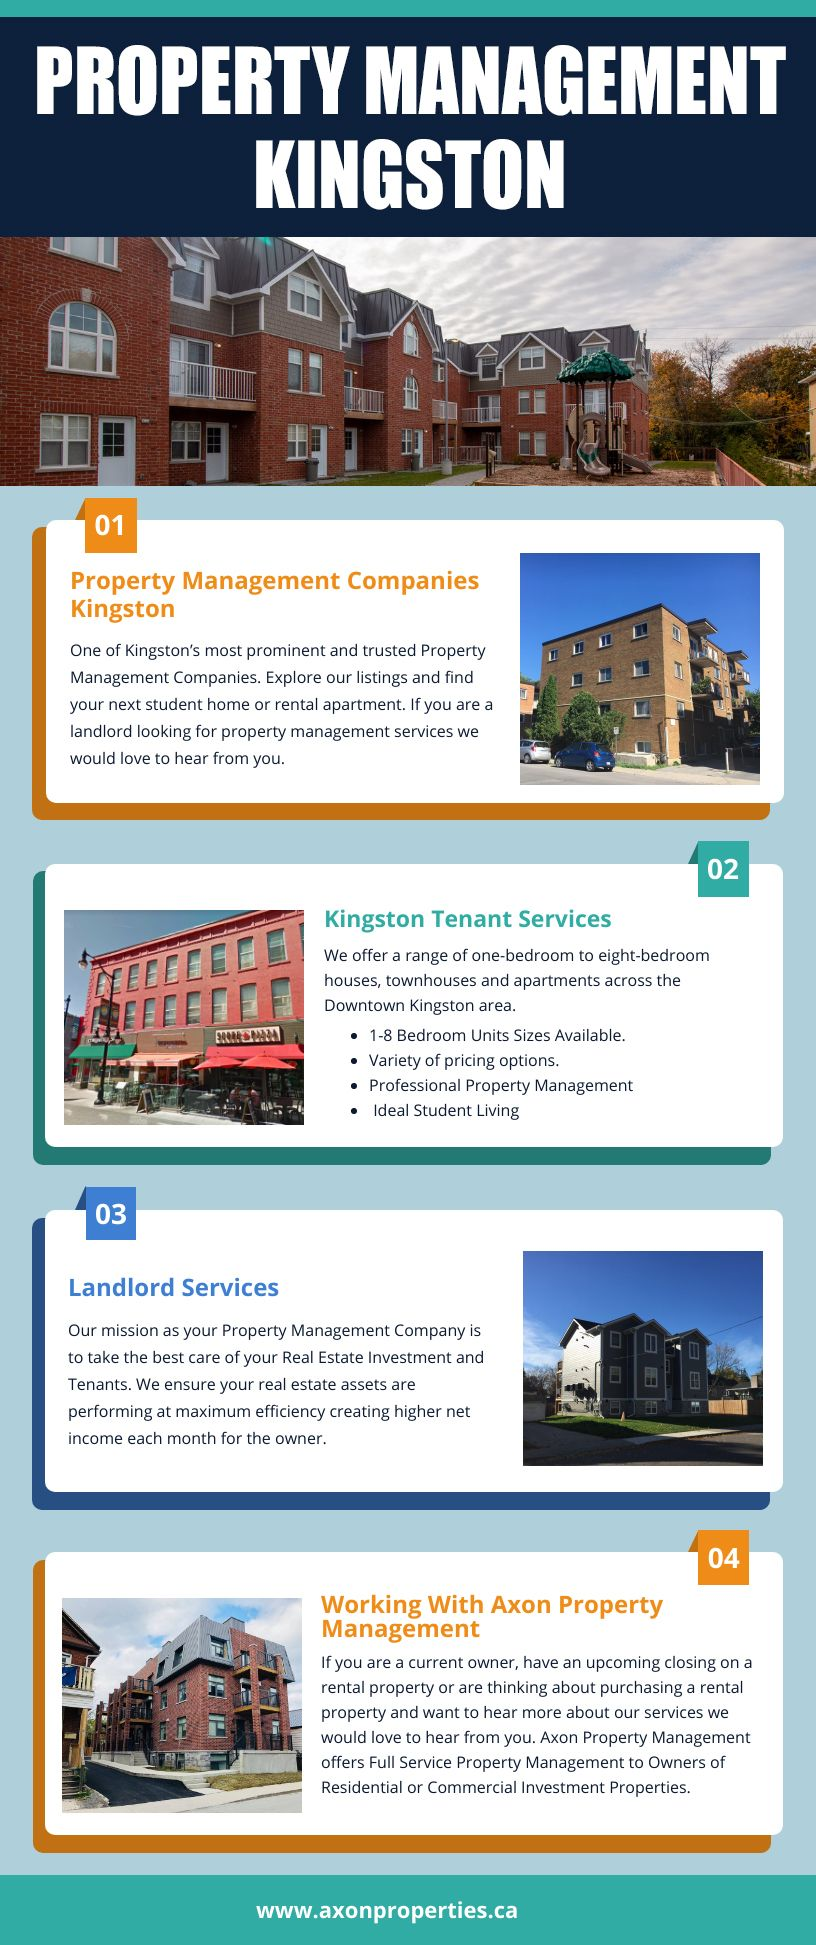 Property Management Kingston in 2020 Rental, Property